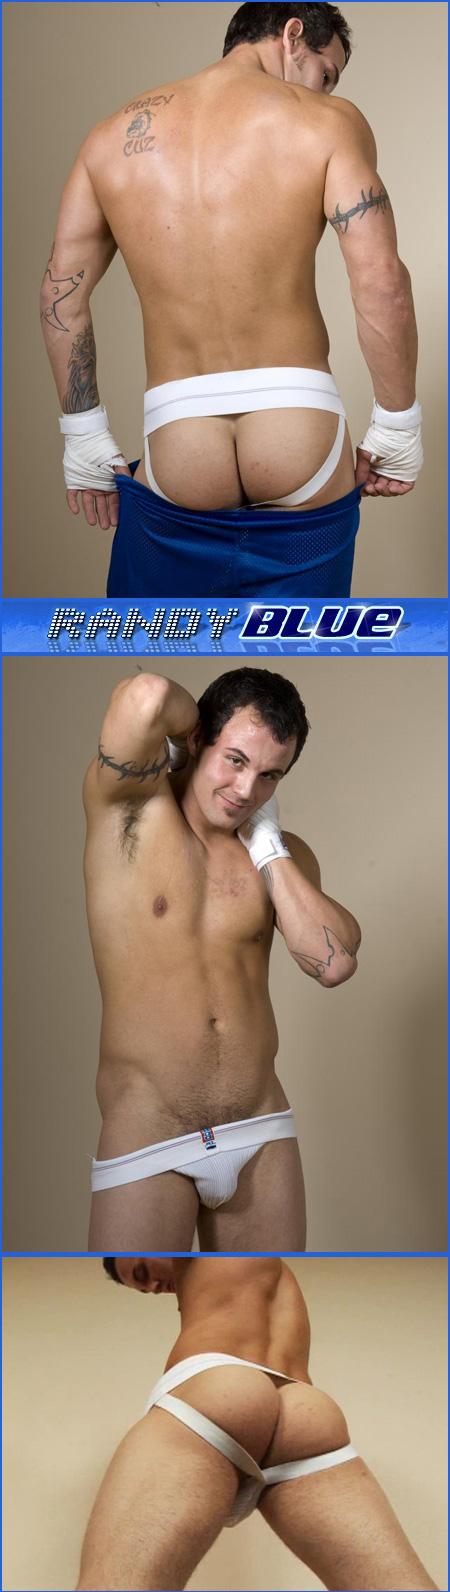 randy blue jockstrap set